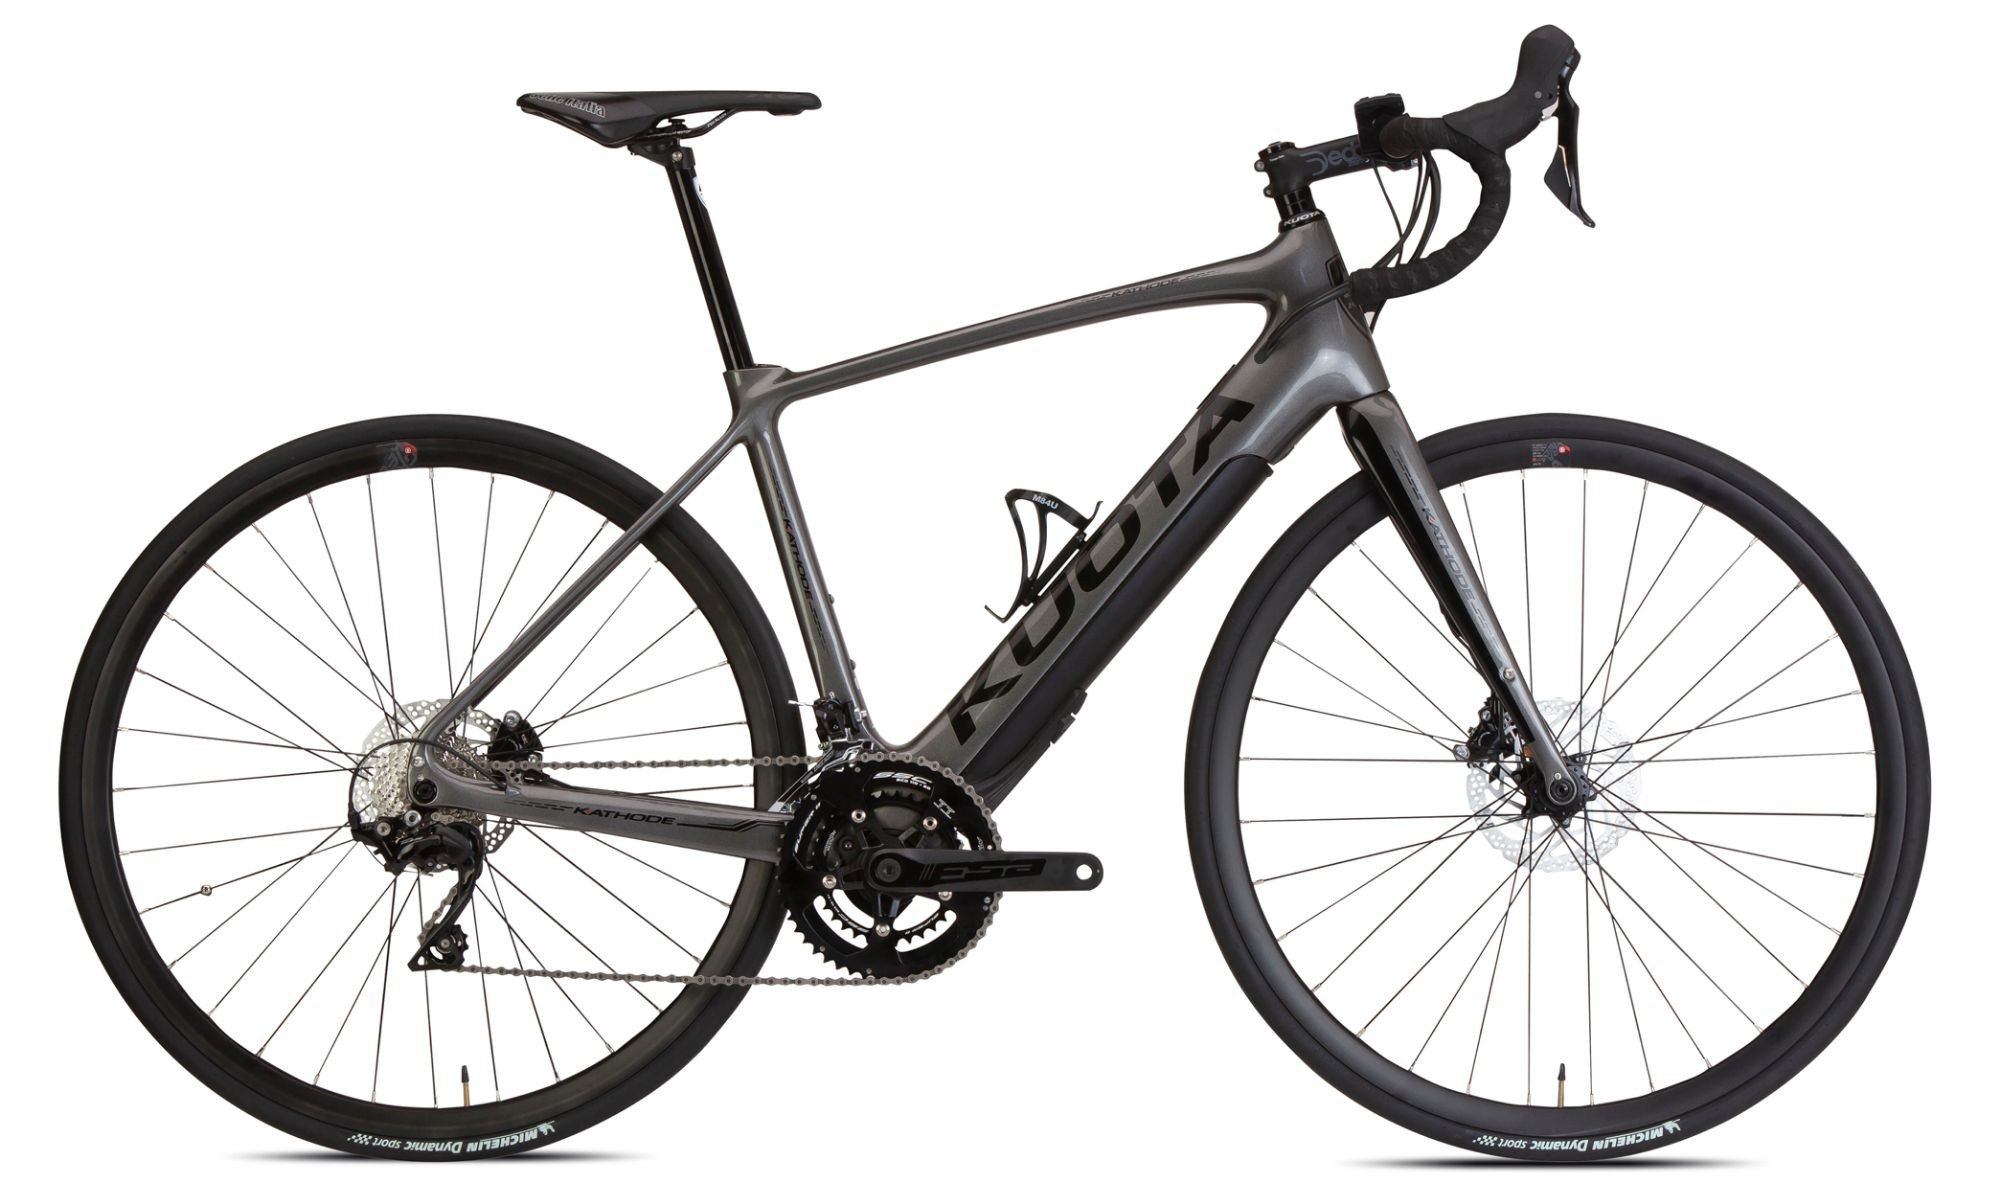 Kuota-Kathode-road-electric-eBike-Belhaven-Bikes-Dunbar-East-Lothian